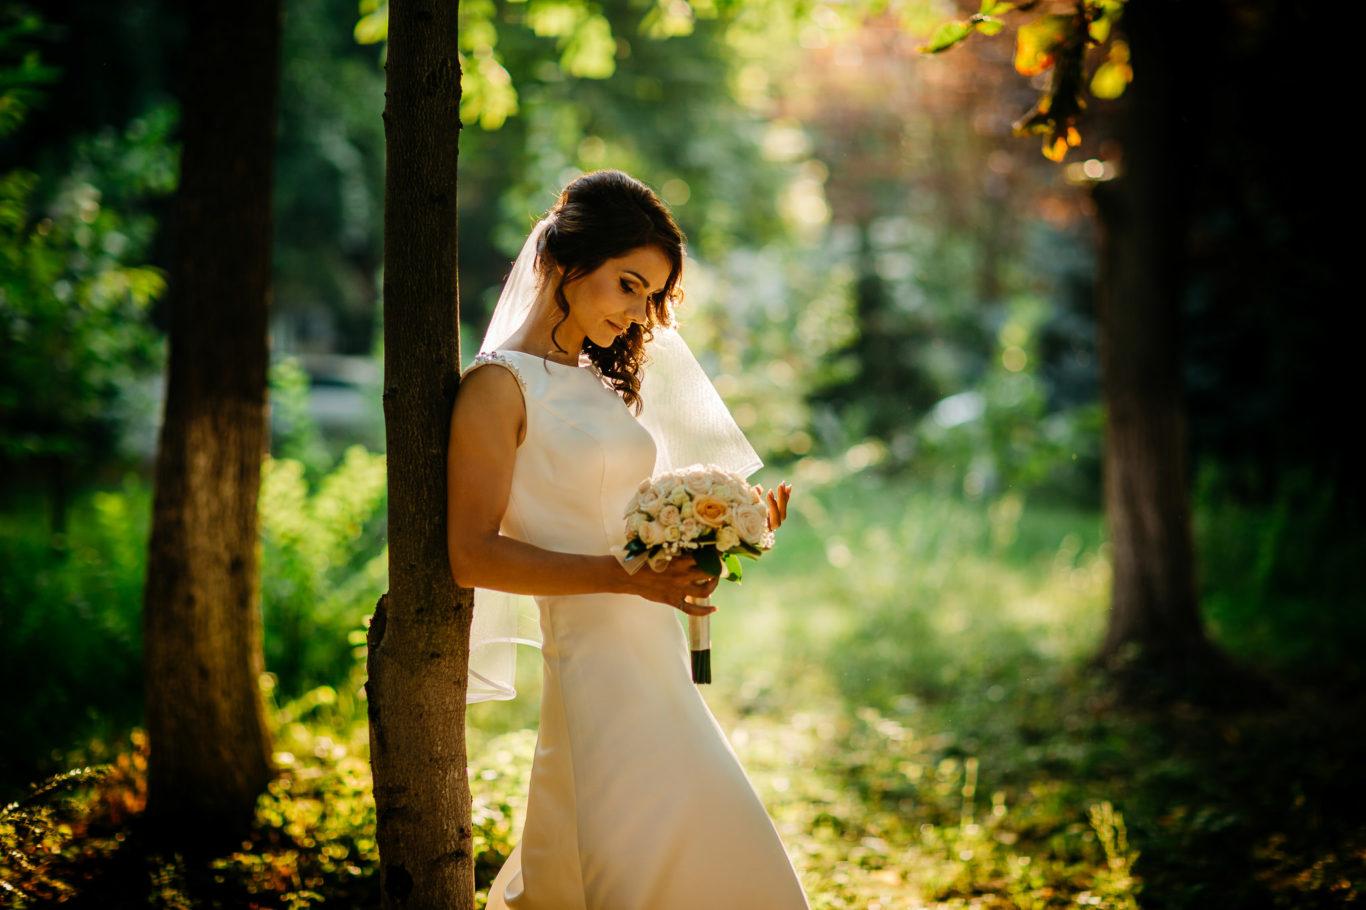 0579-fotografie-nunta-bucuresti-dana-radu-fotograf-ciprian-dumitrescu-cd2_7906